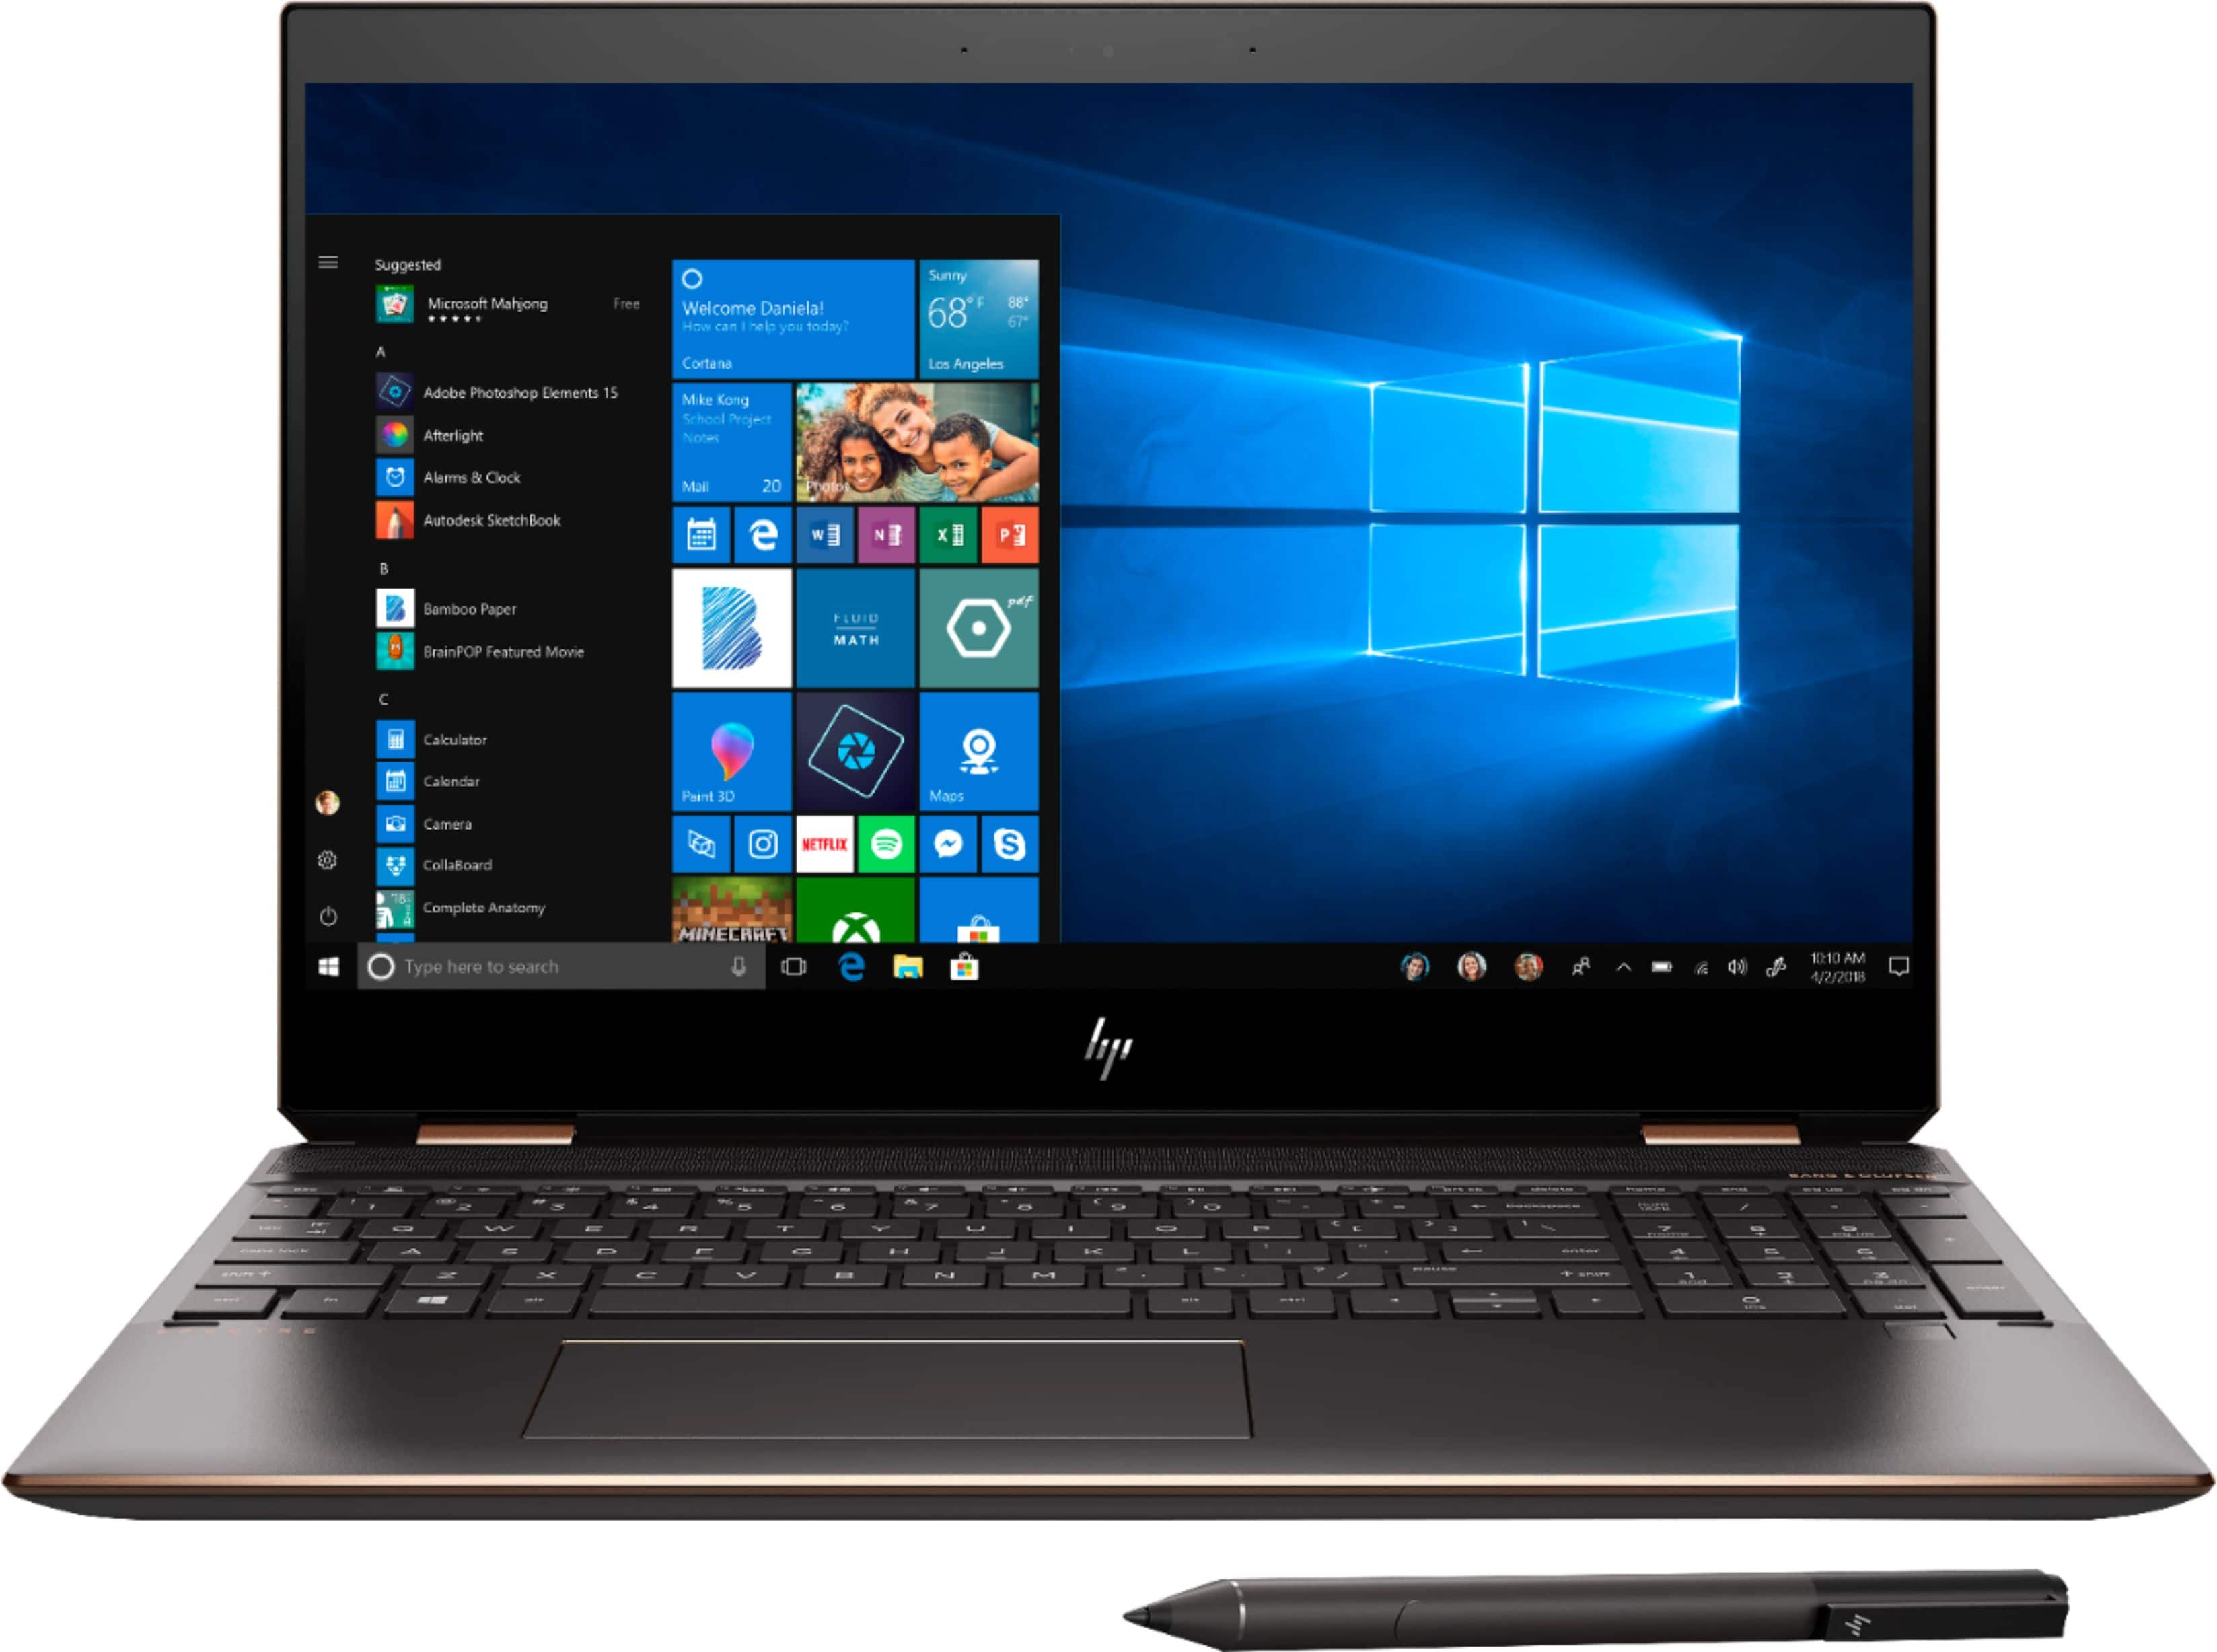 "HP - Spectre x360 2-in-1 15.6"" 4K Ultra HD Touch-Screen Laptop - Intel Core i7 - 16GB Memory - 512GB SSD + 32GB Optane - Dark Ash Silver, Sandblasted Anodized Finish $1099.99"